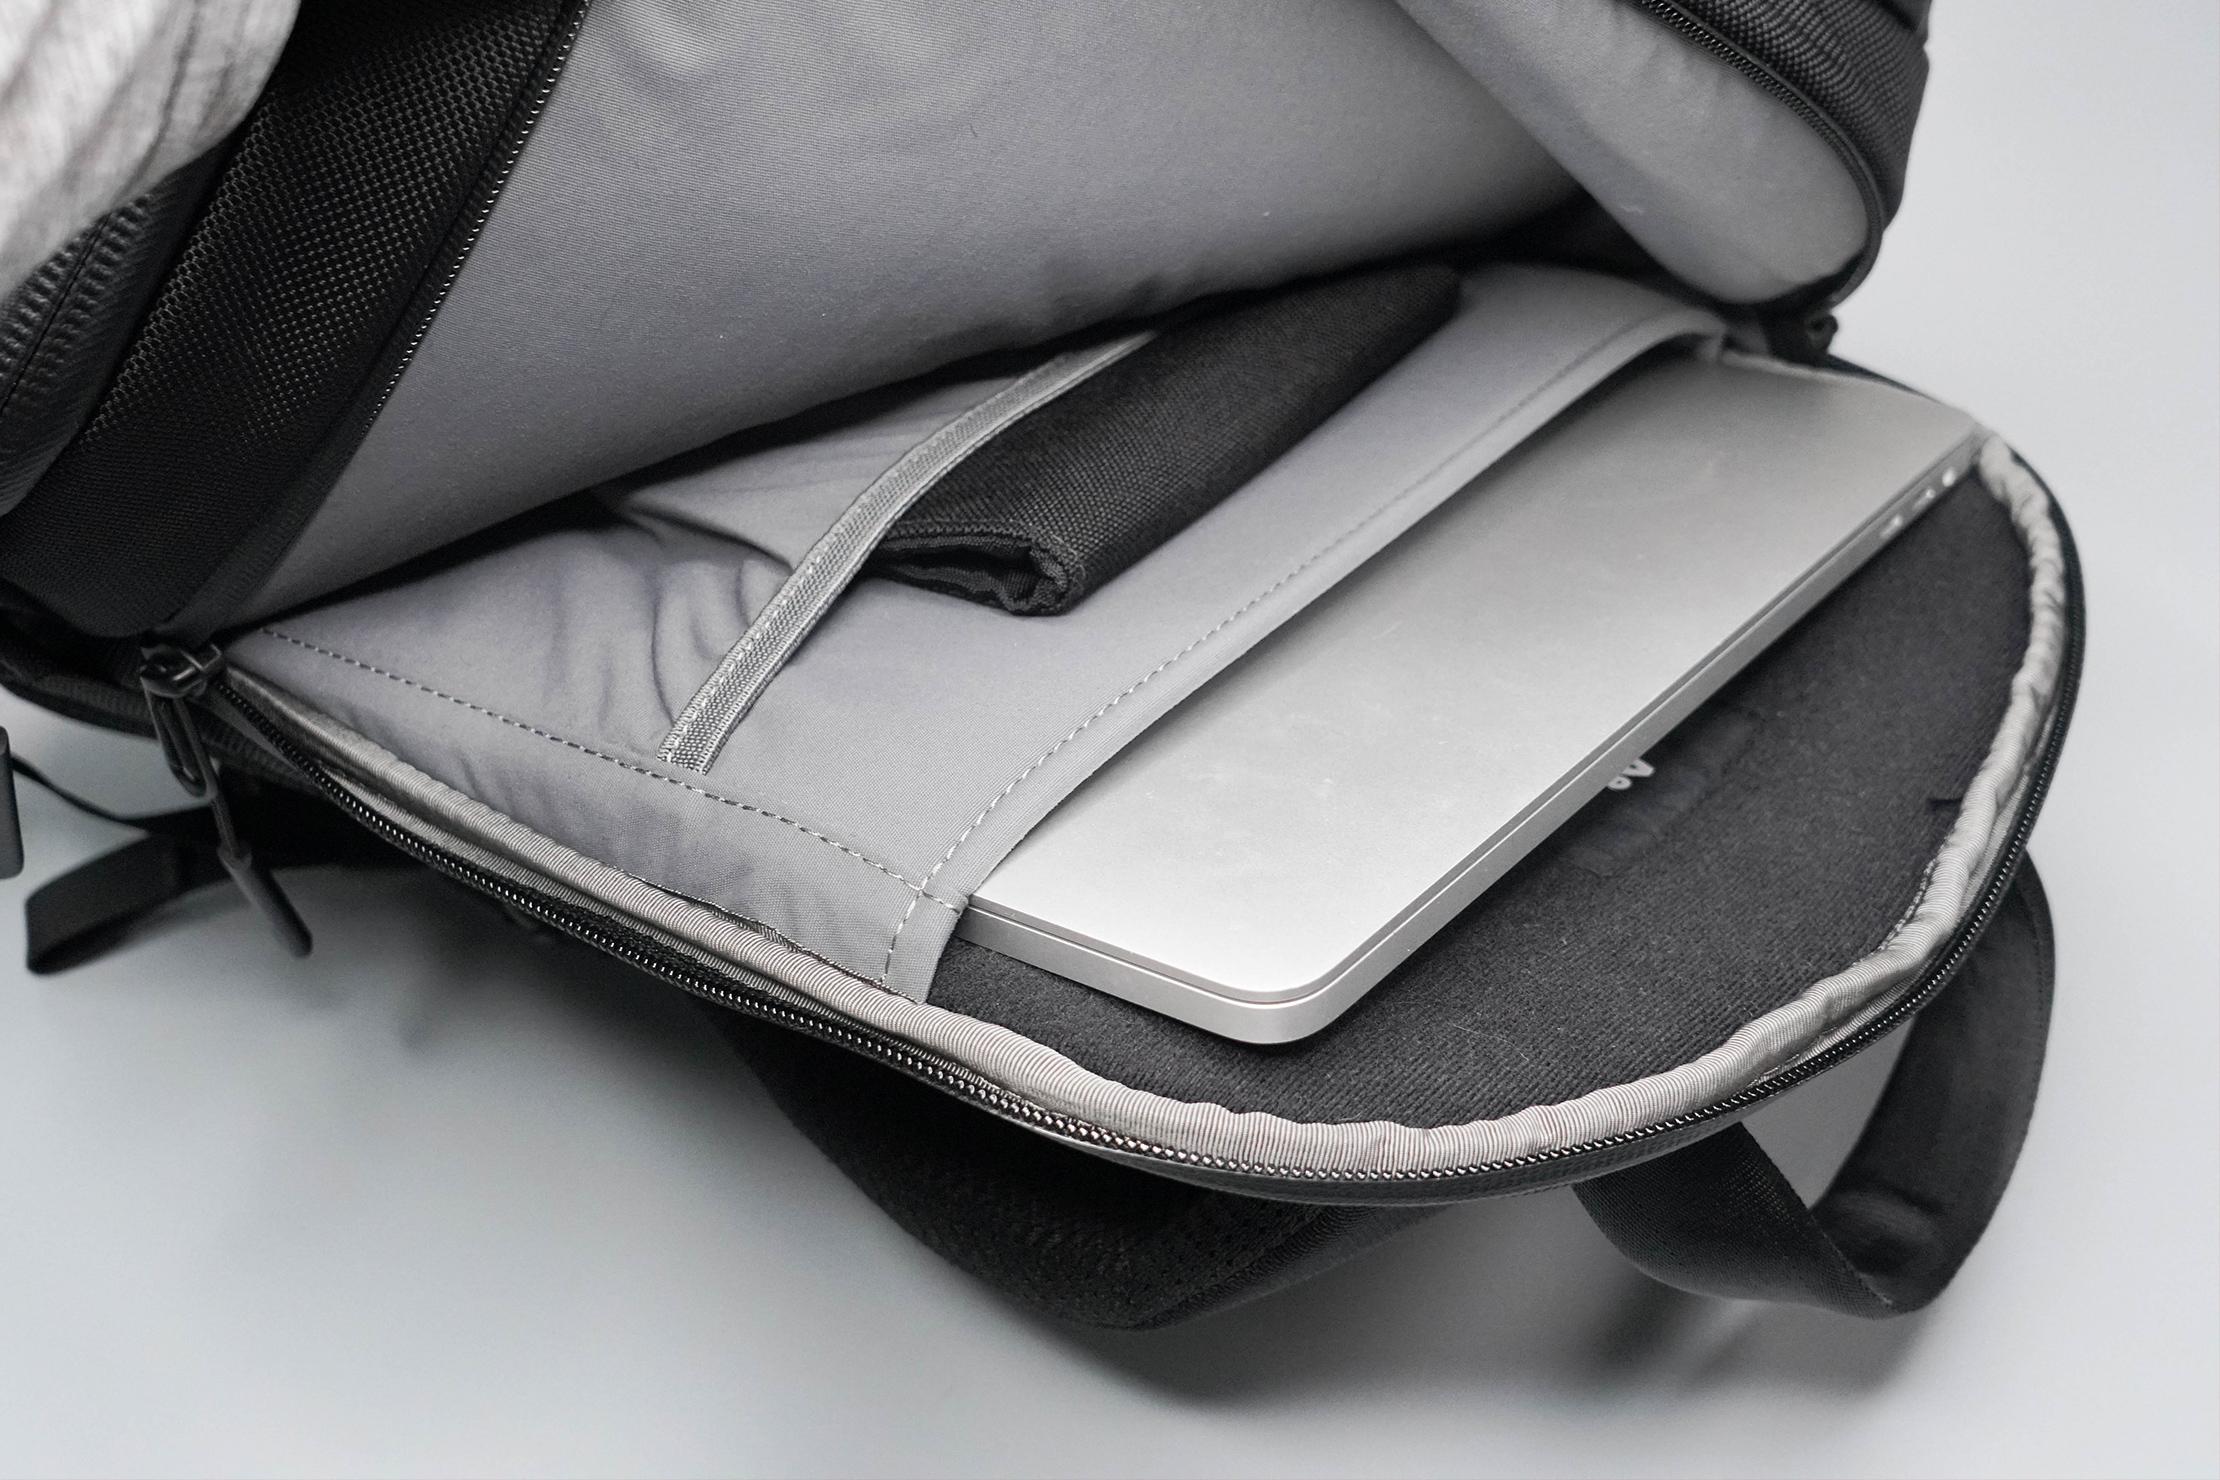 Aer Tech Pack 2 Laptop Compartment